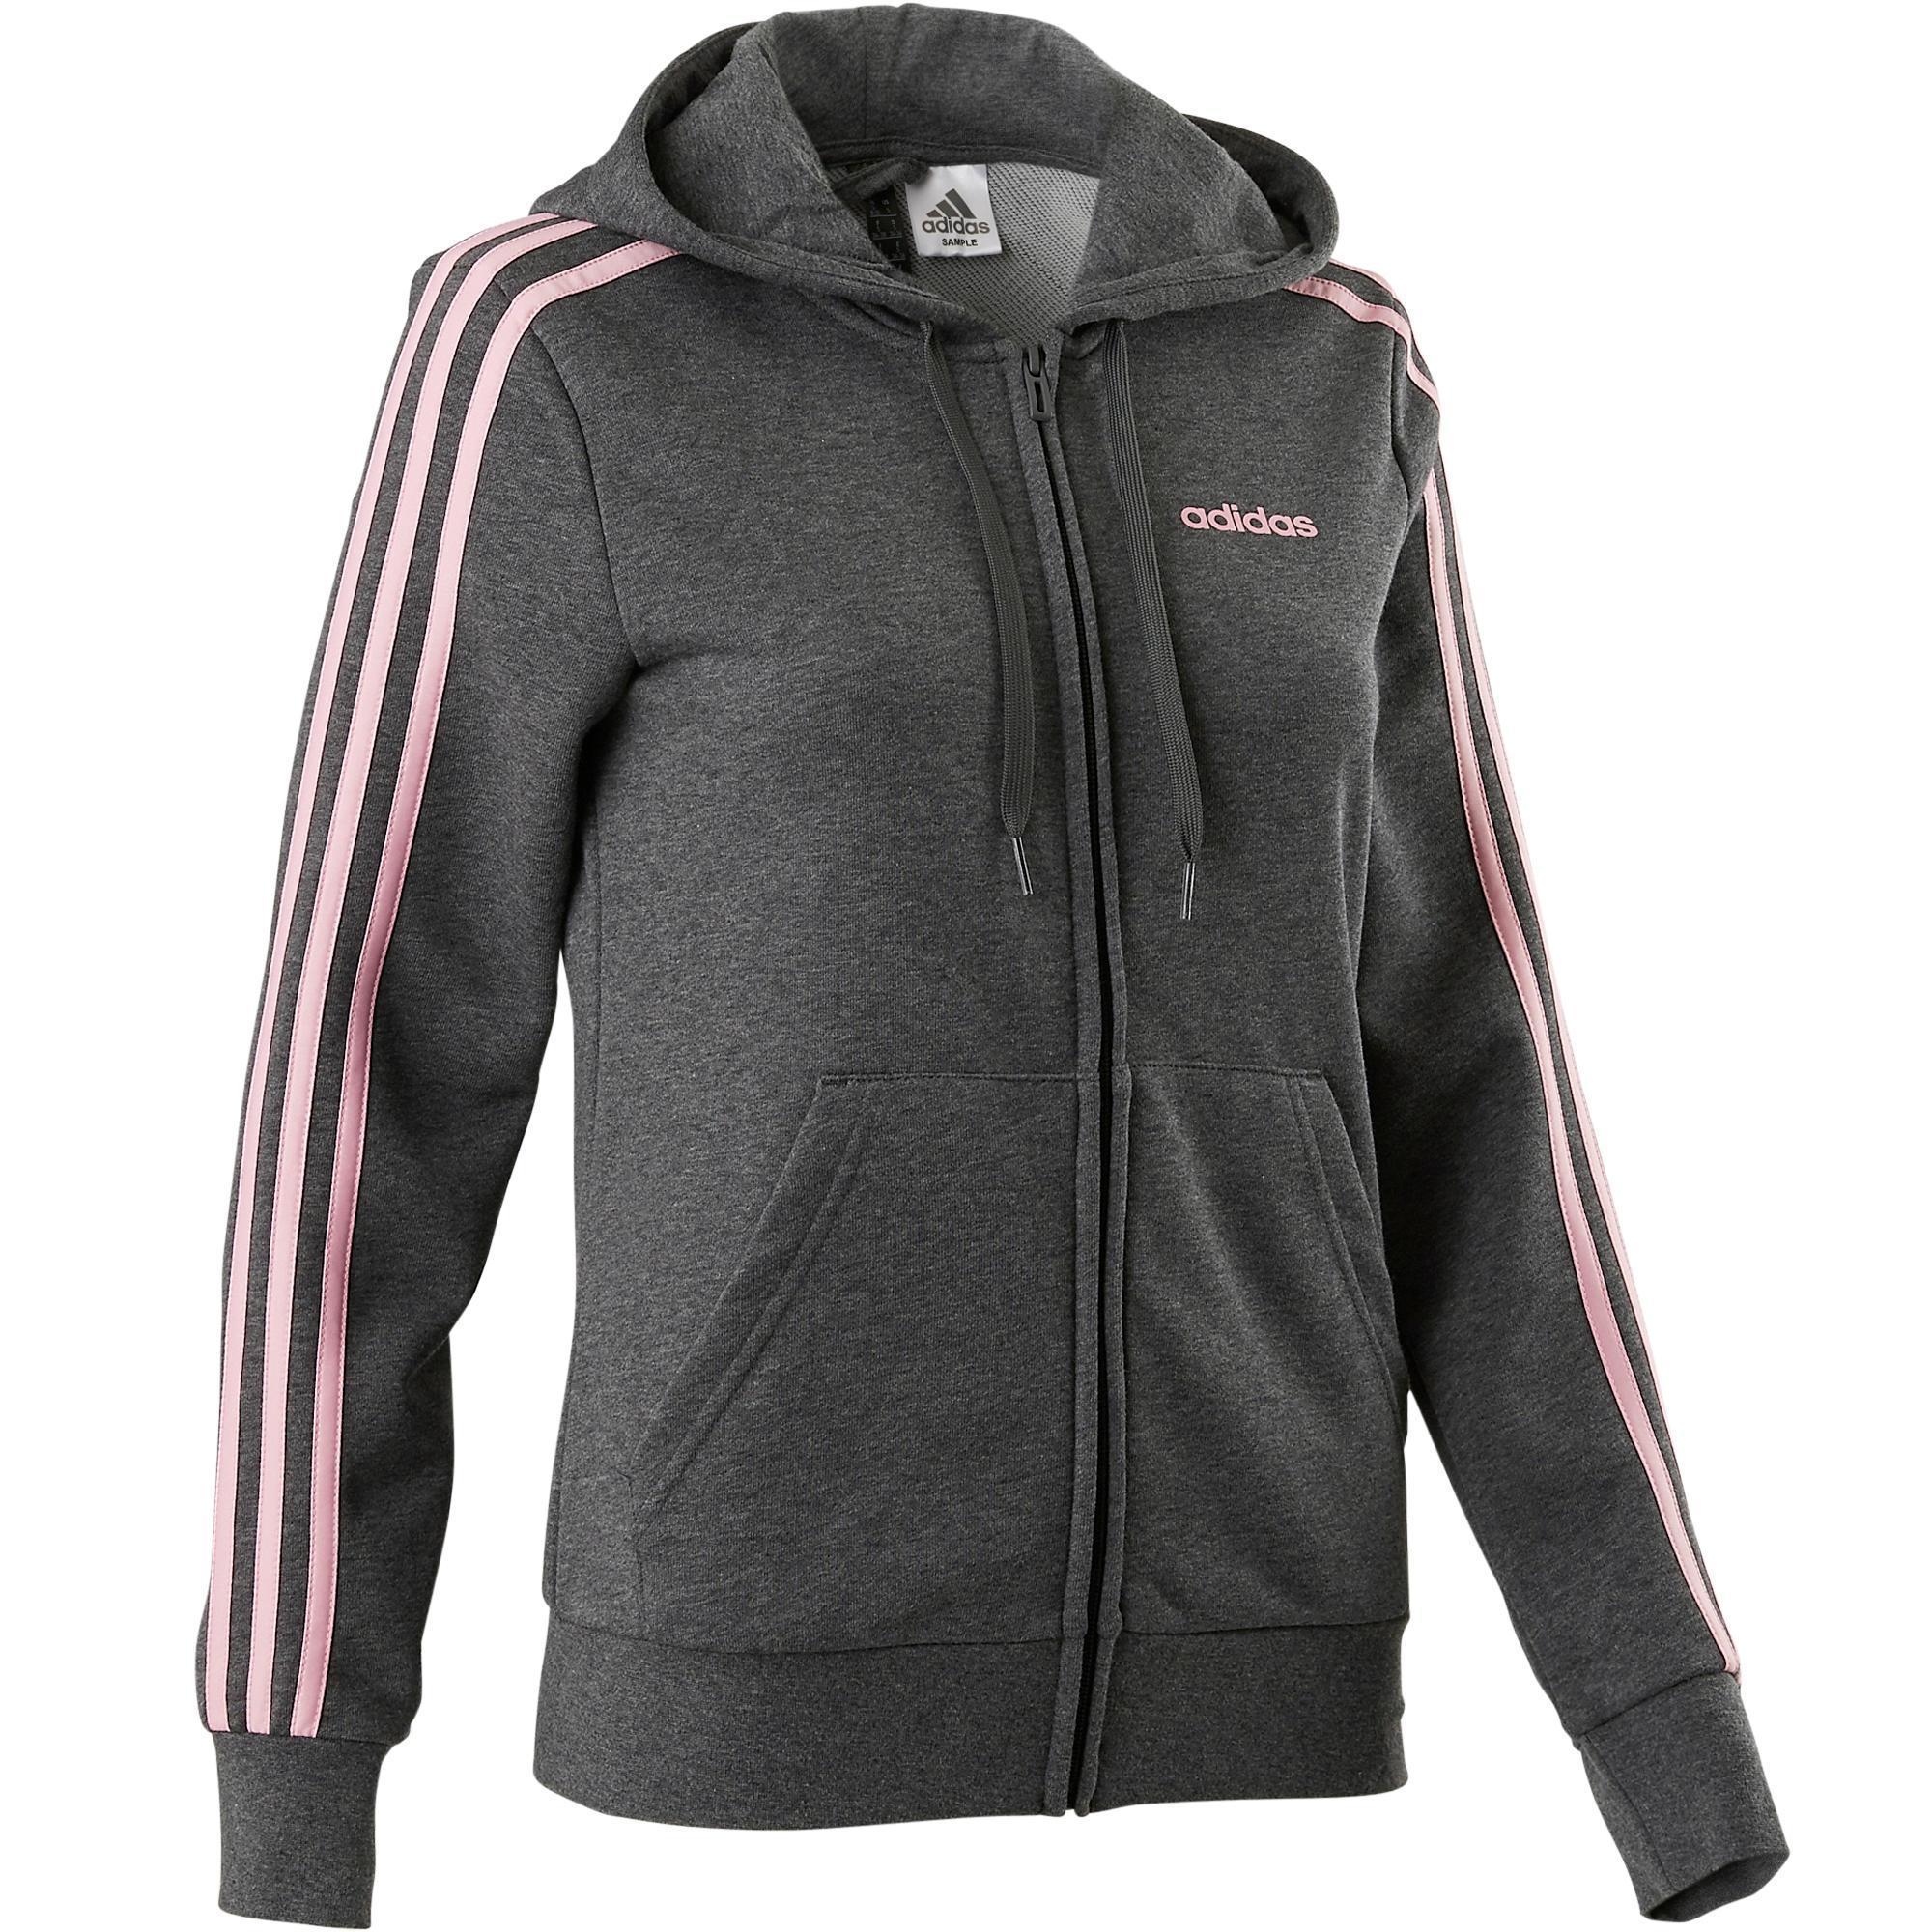 709893a82e4 Adidas Damesvest Adidas 3S 500 voor pilates en lichte gym grijs roze    Decathlon.nl